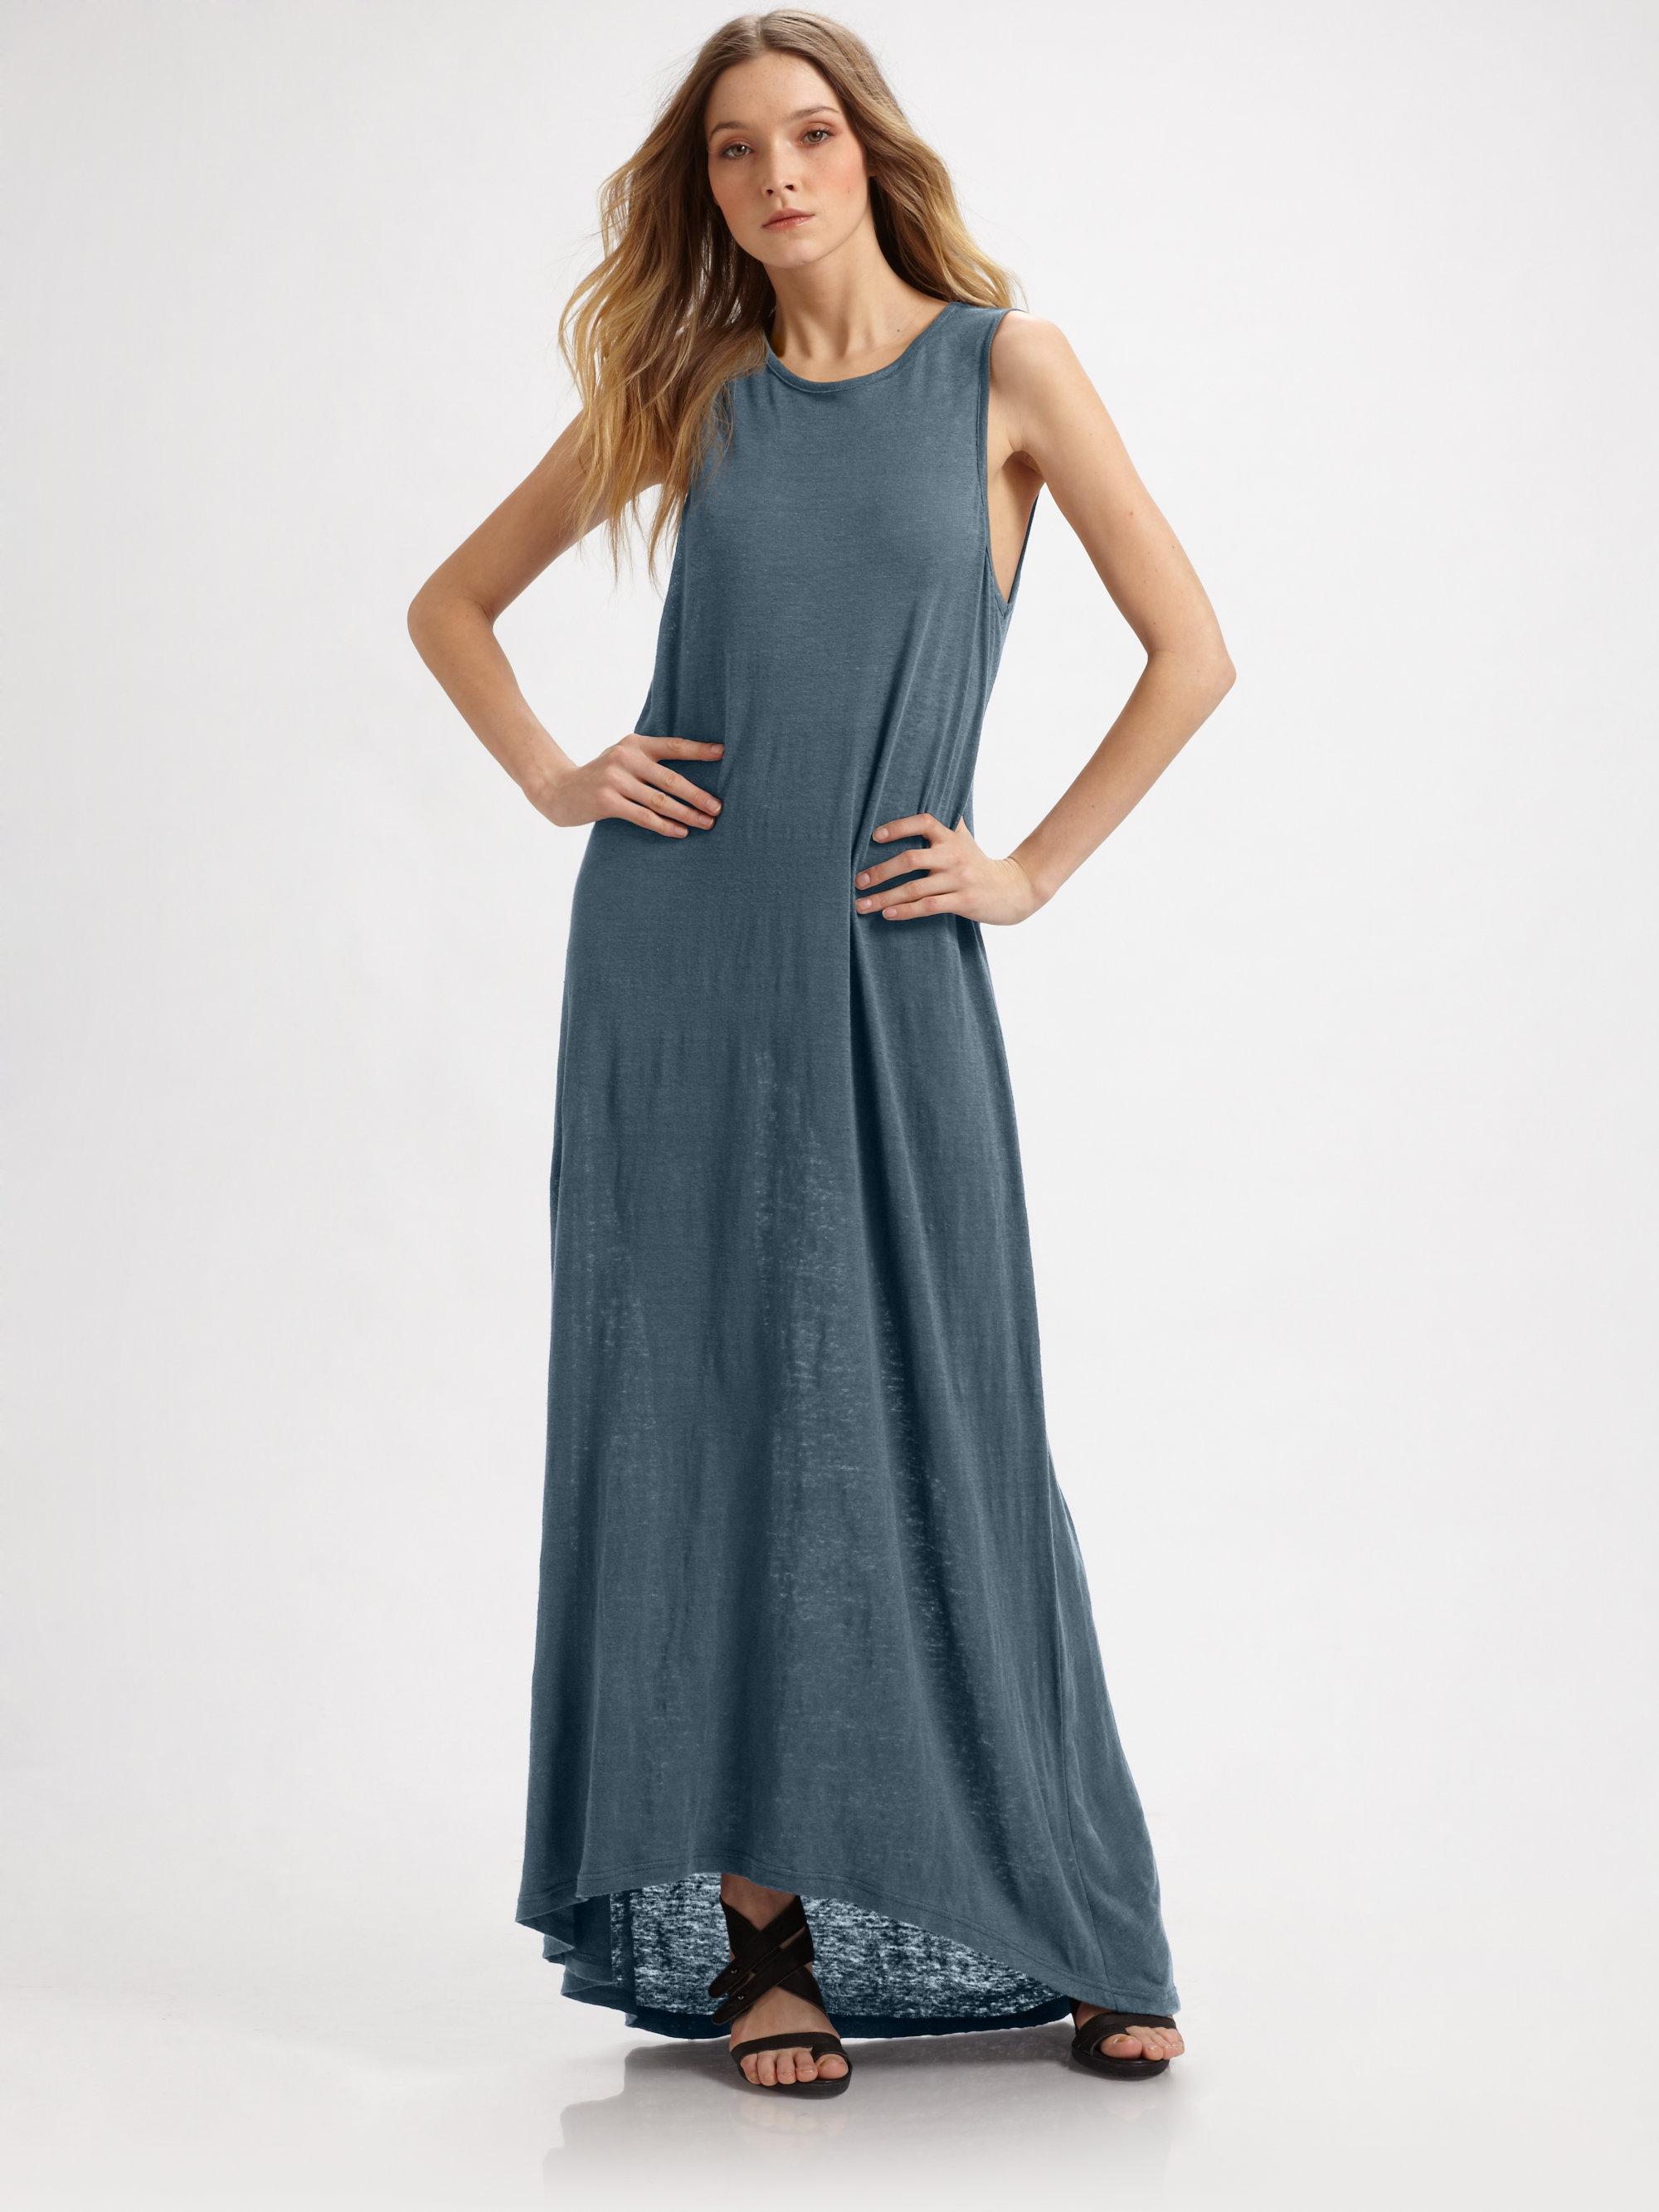 Pjk patterson j. kincaid Barcelona Linen Maxi Dress in Blue | Lyst